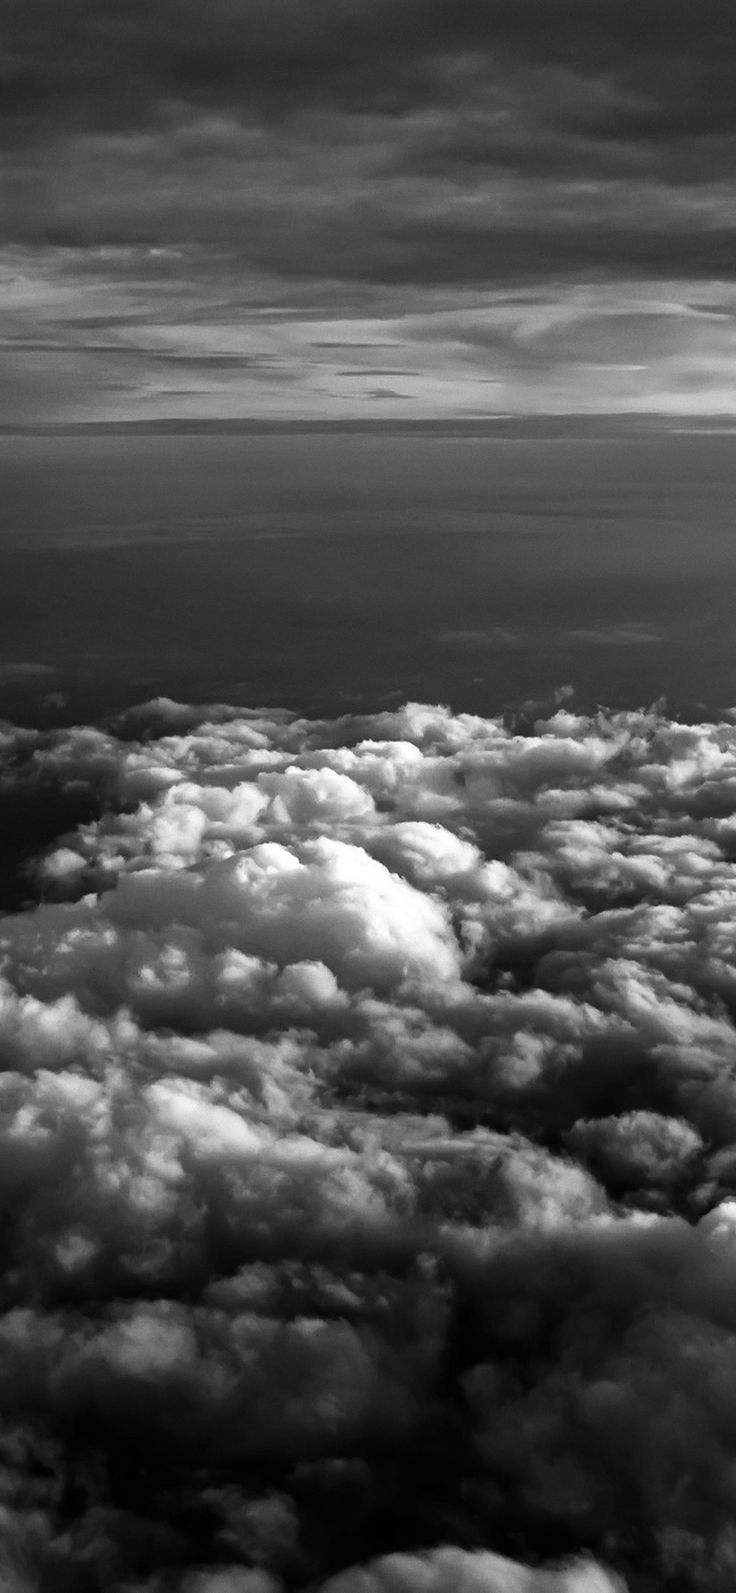 Iphone X Wallpaper Mq81 Cloud Flare Sky View Nature White Dark Via